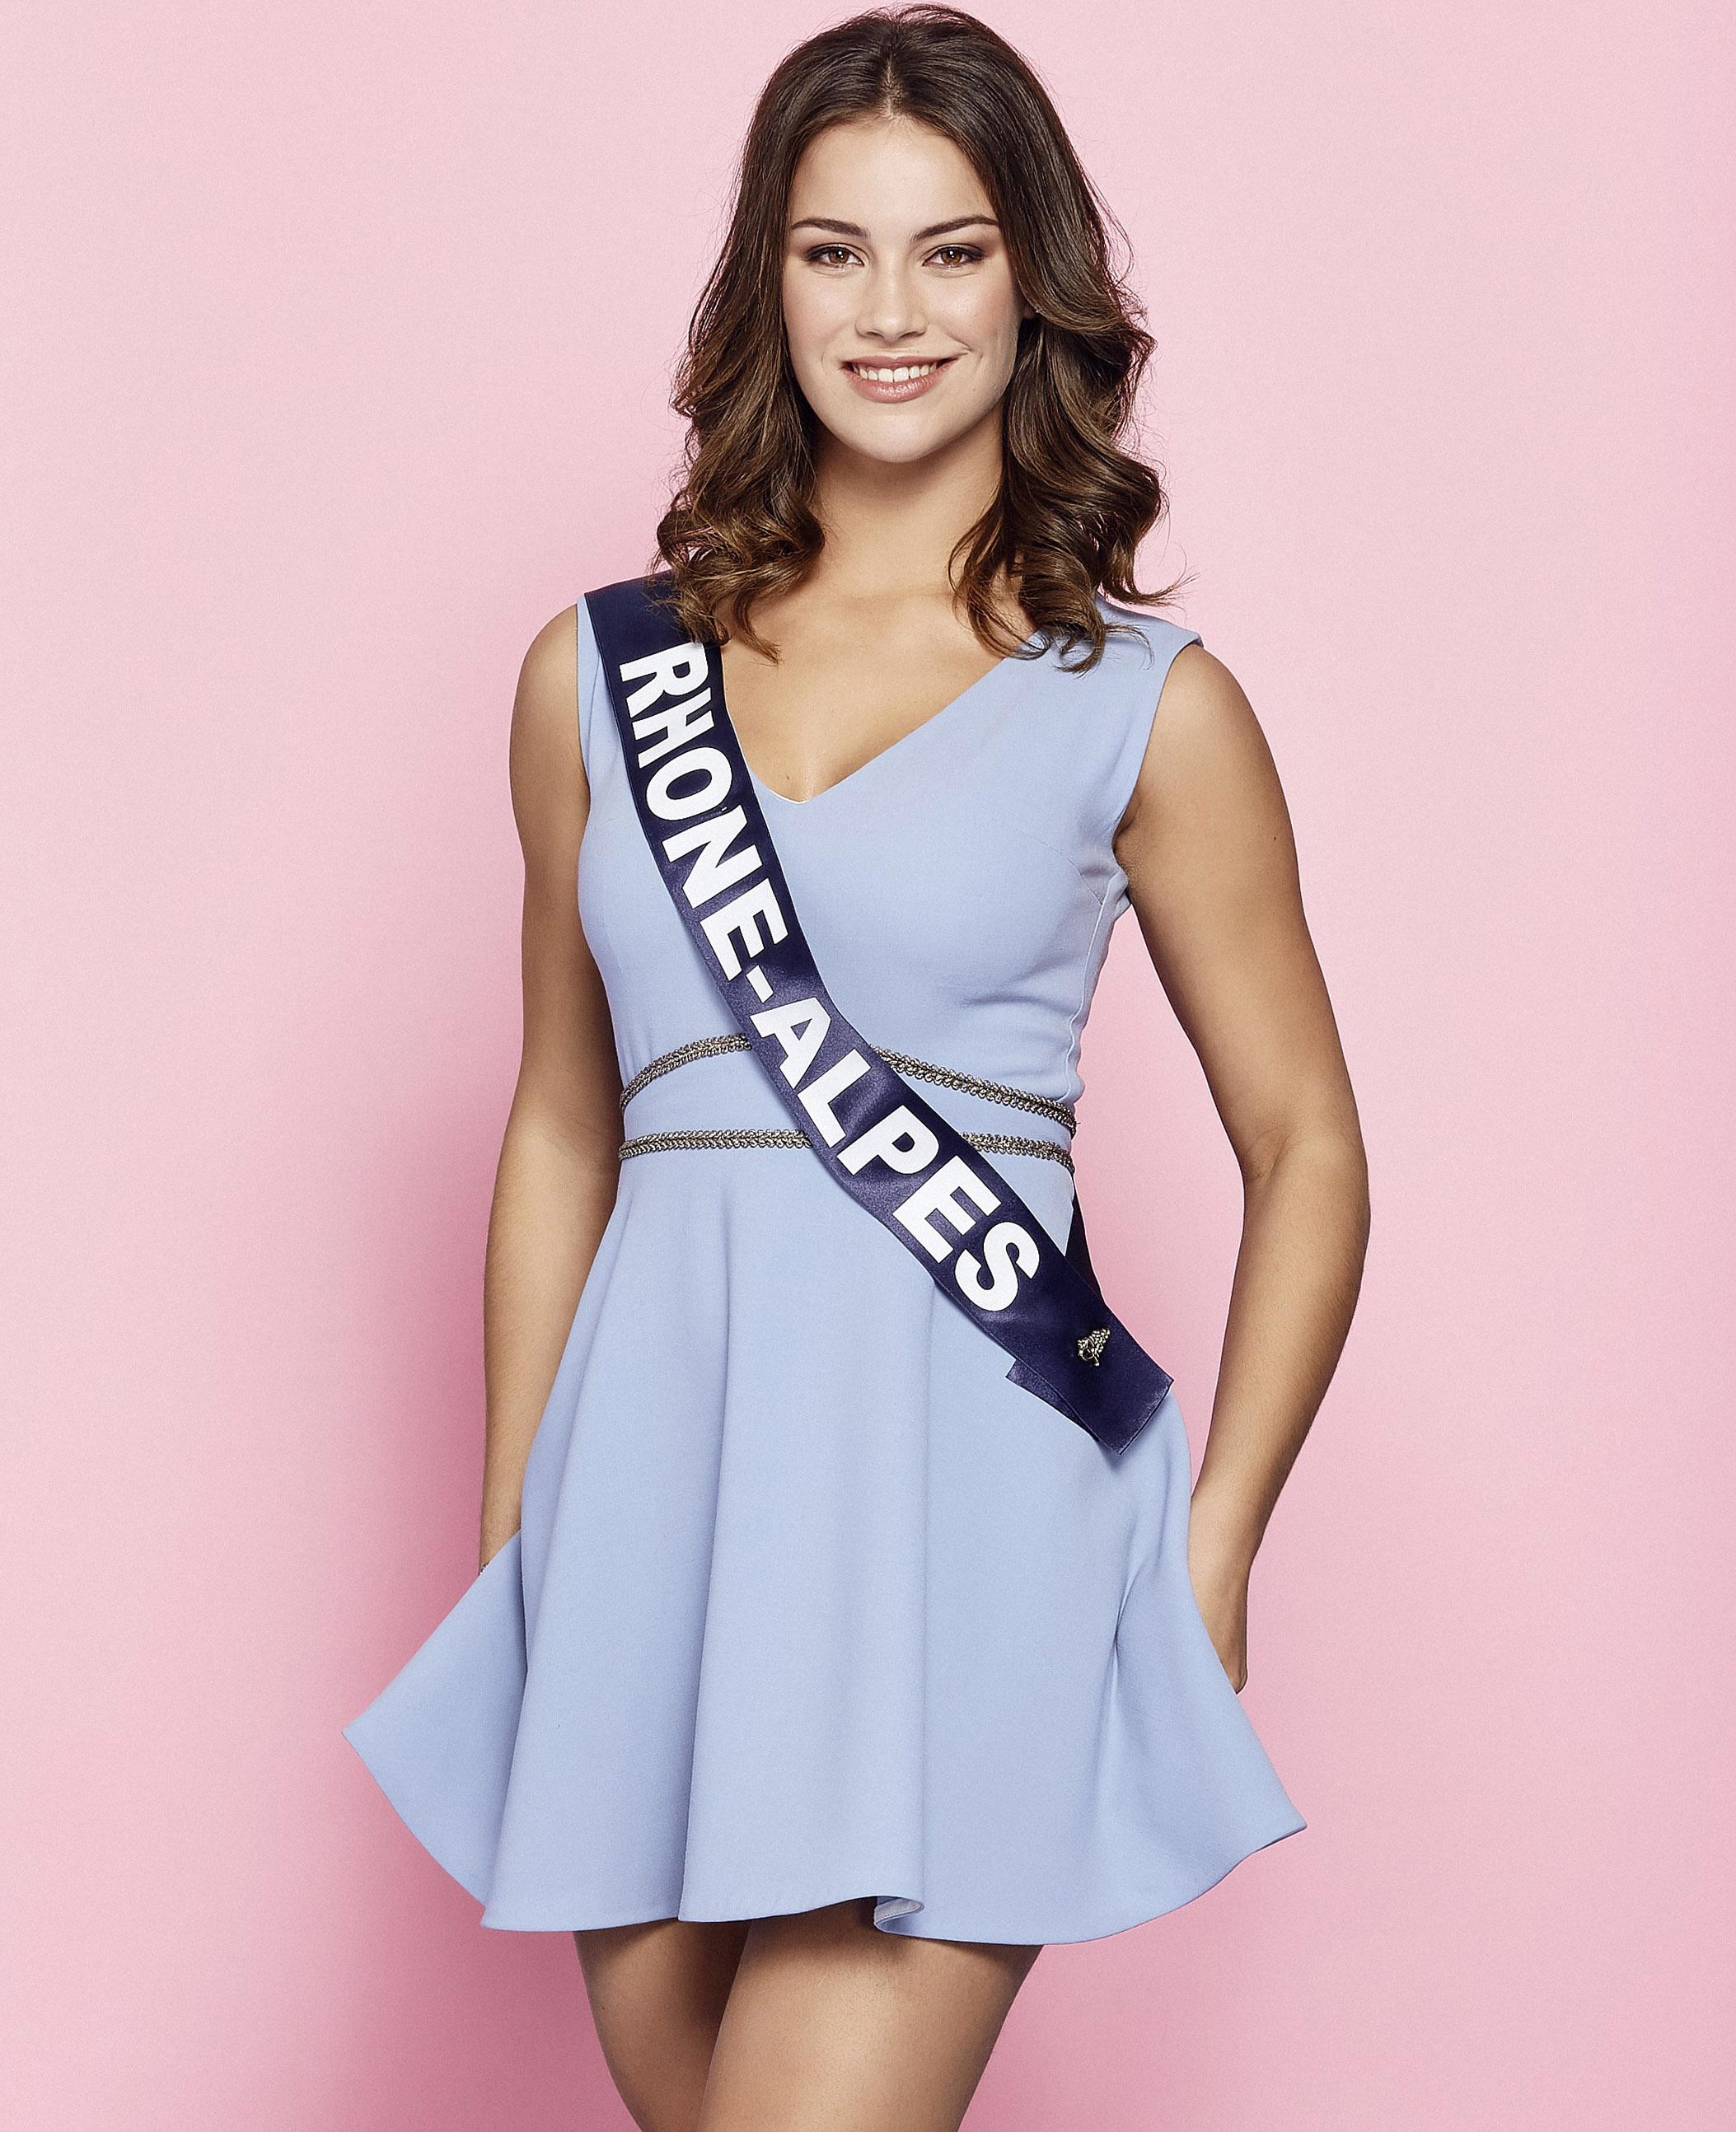 Miss Rhone-Alpes - Pauline Ianiro